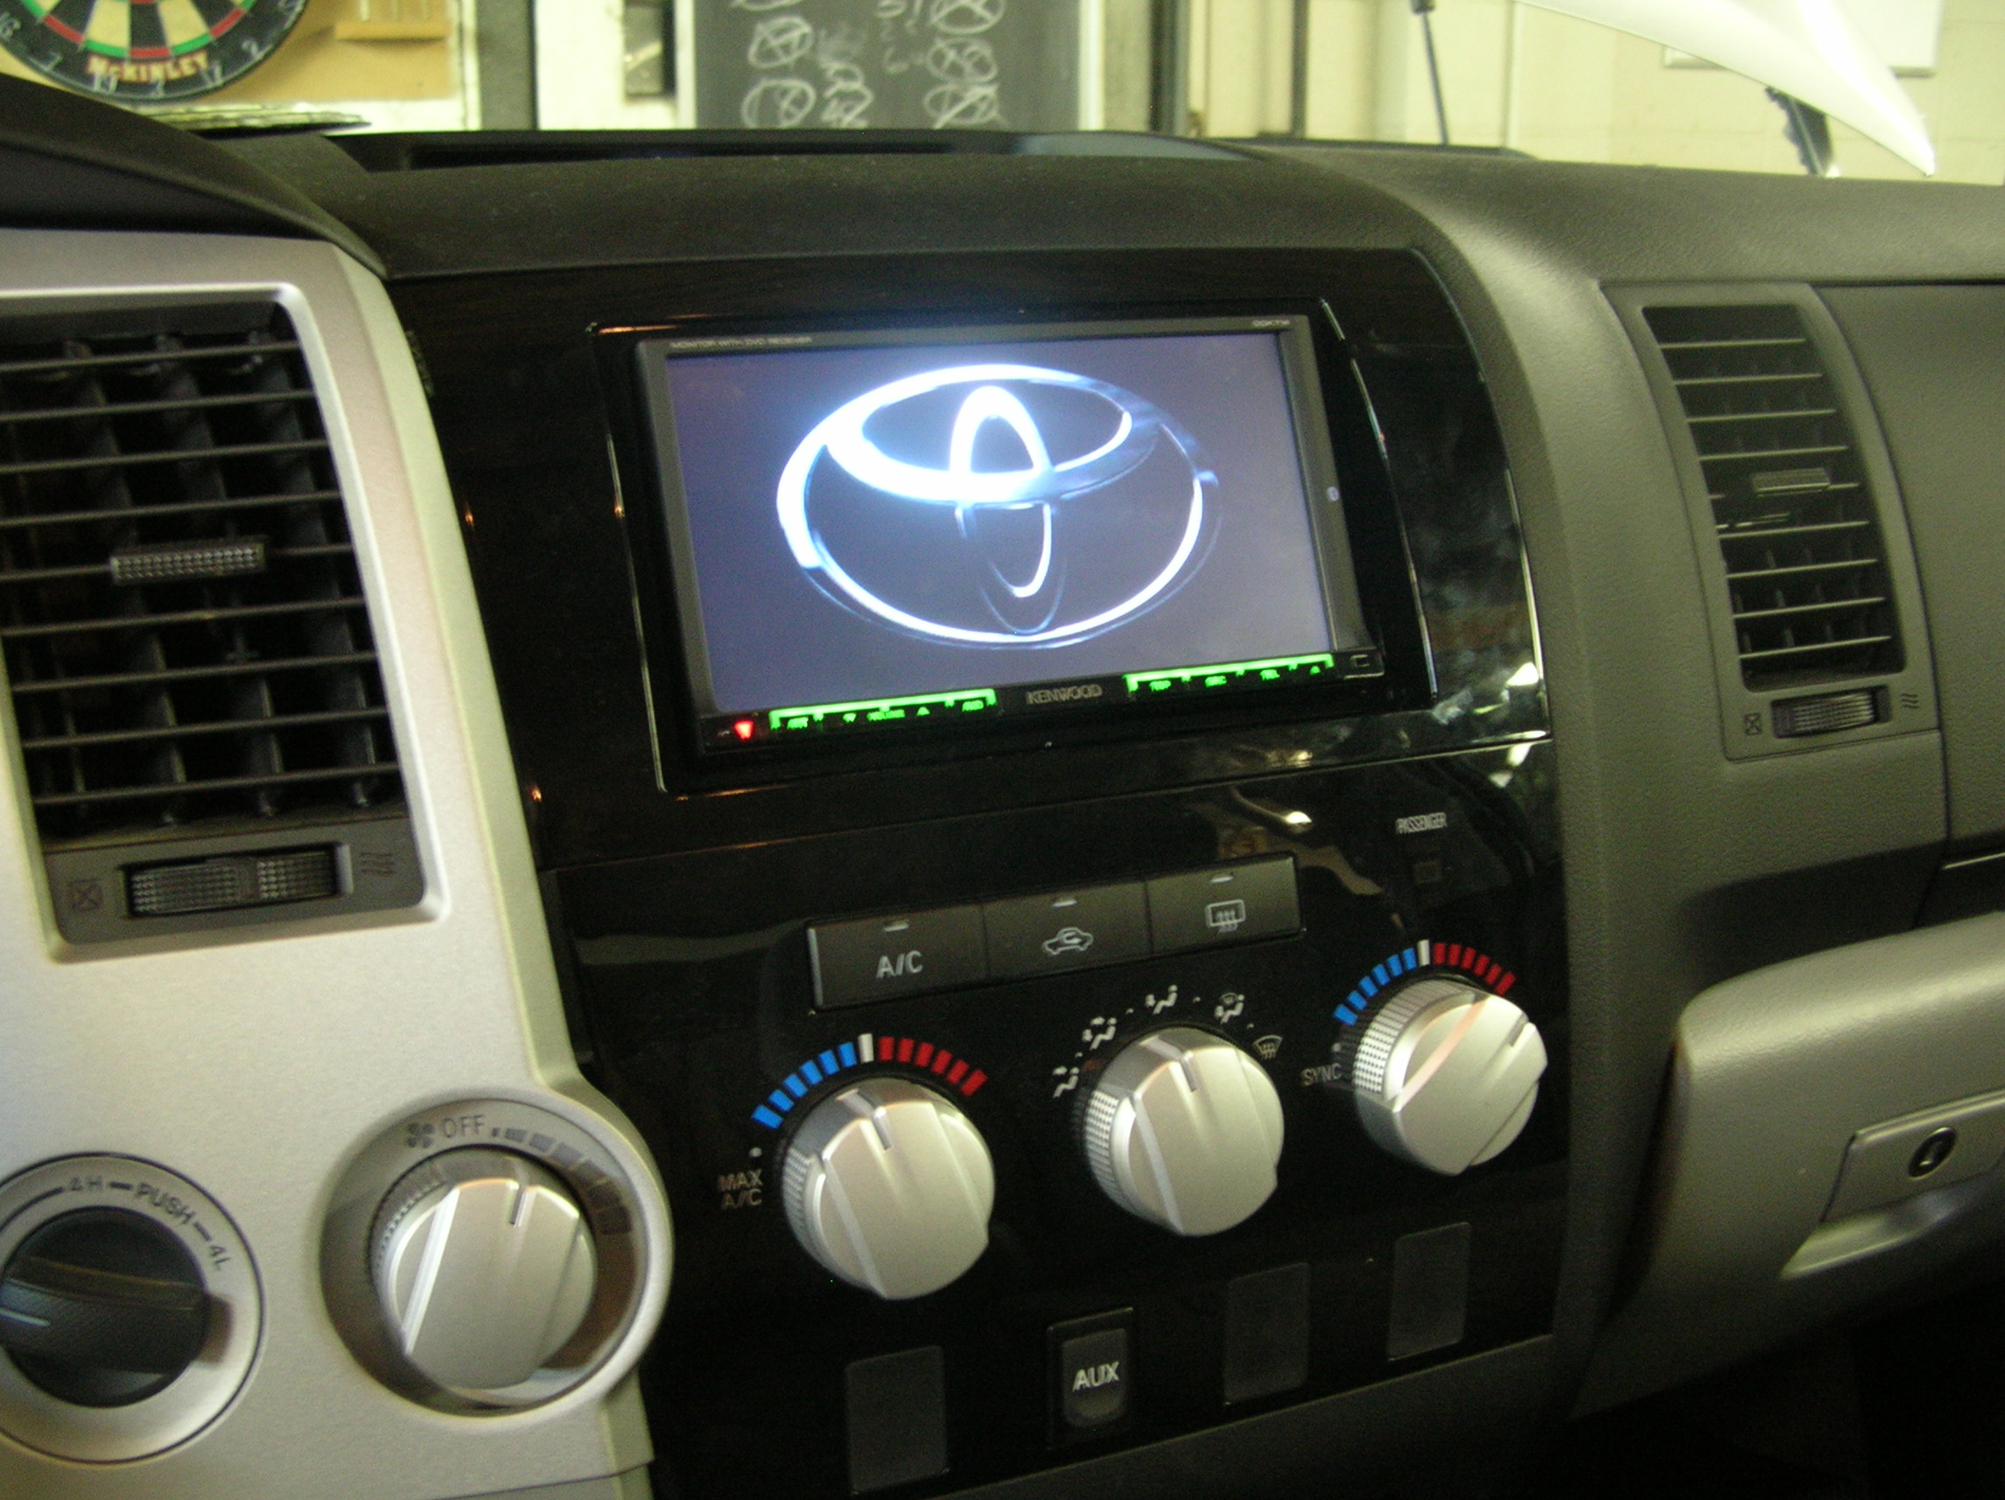 2008 Chevy Silverado Radio Wiring Diagram Together With 2004 Toyota